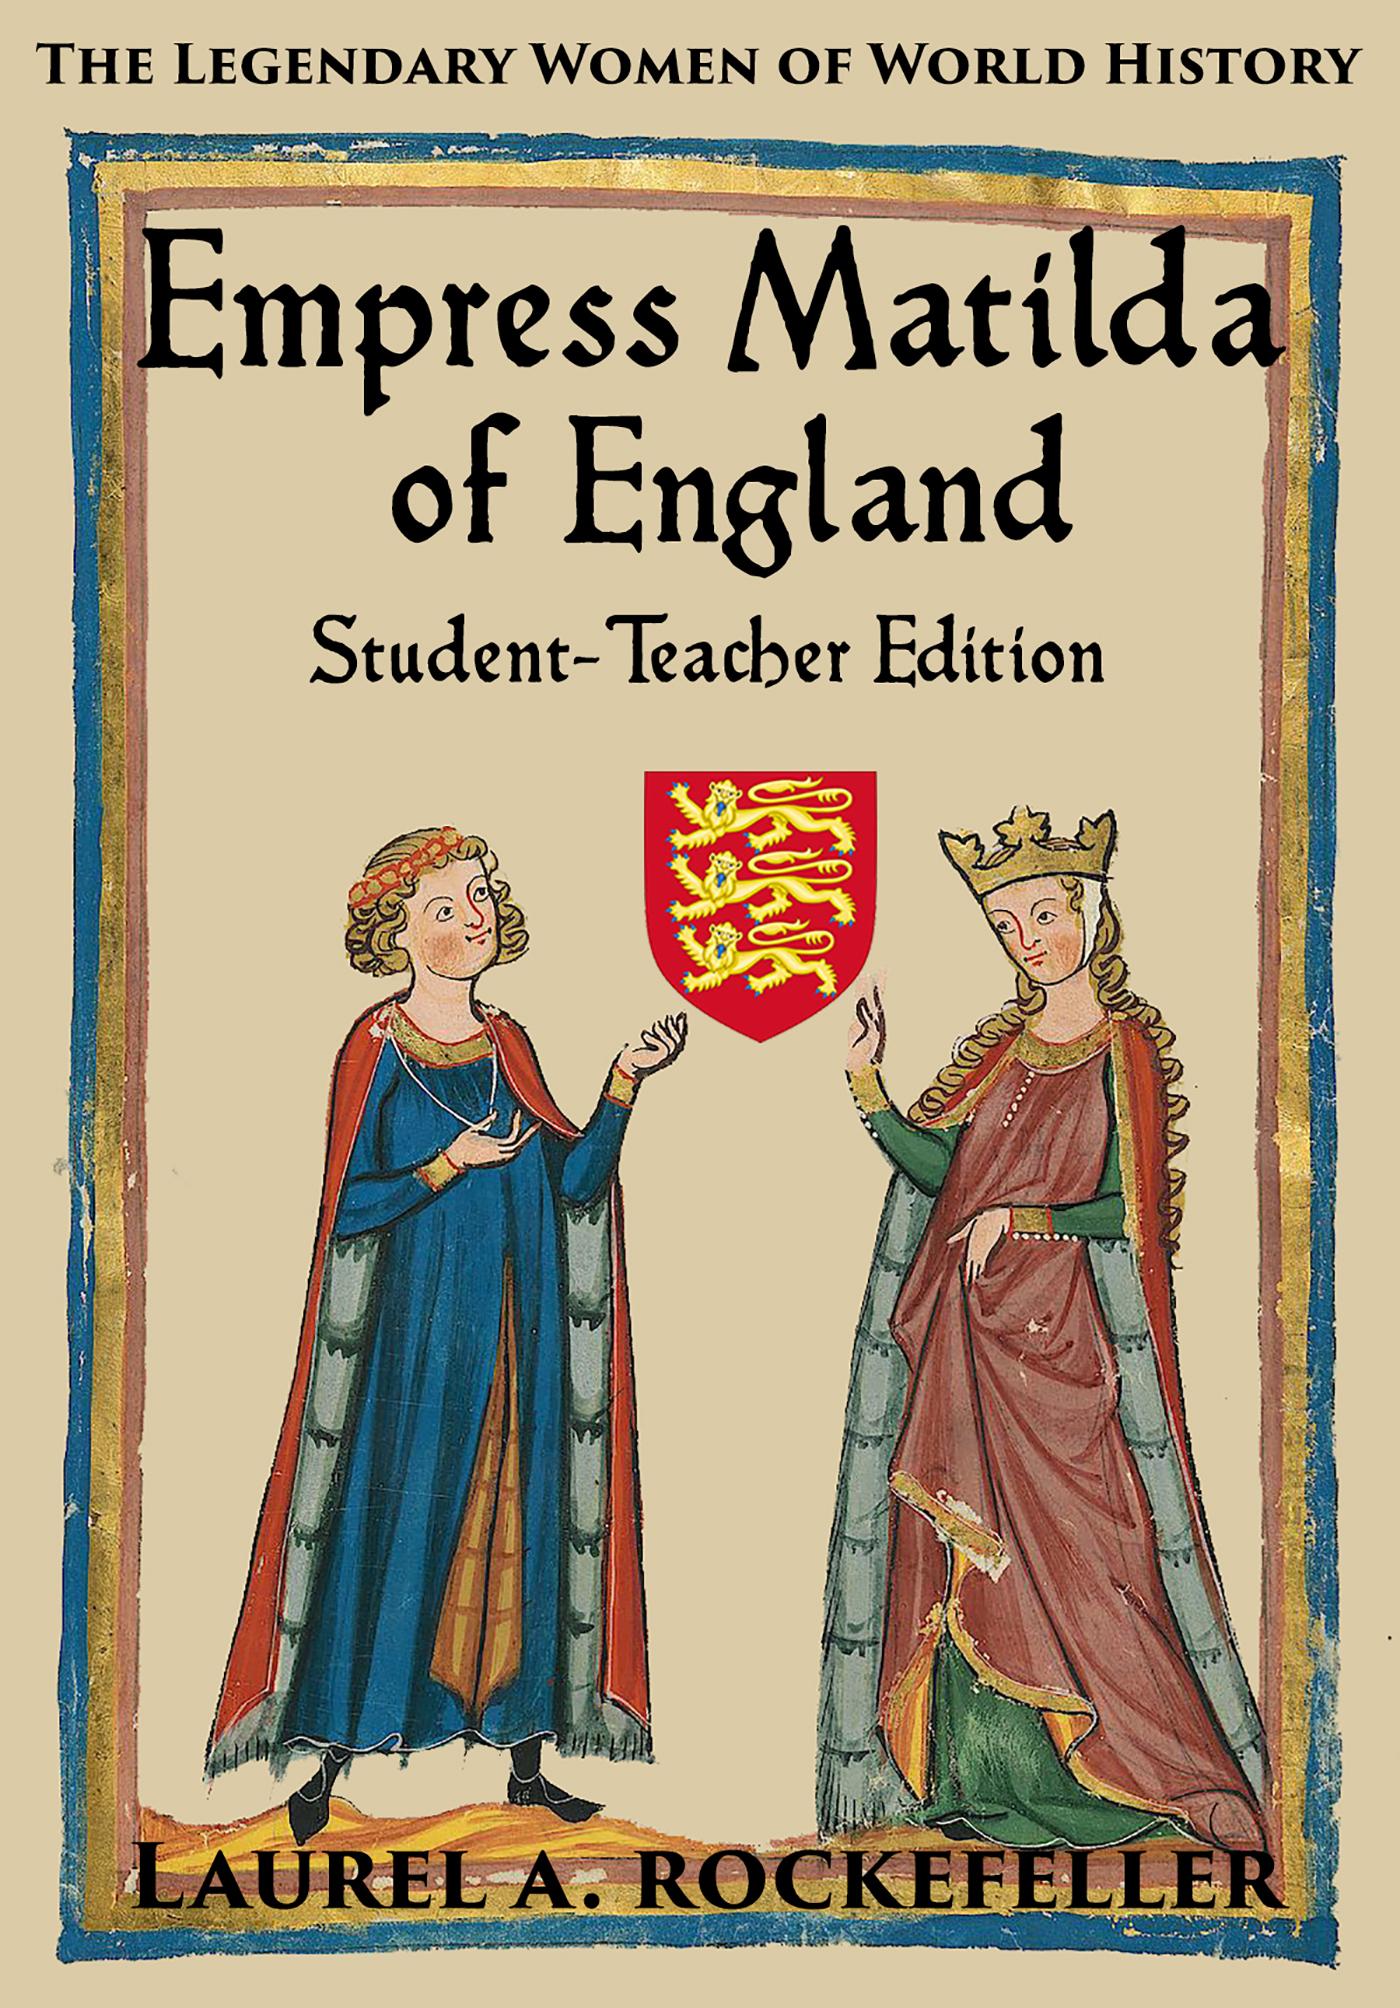 Empress matilda of england: student-teacher edition